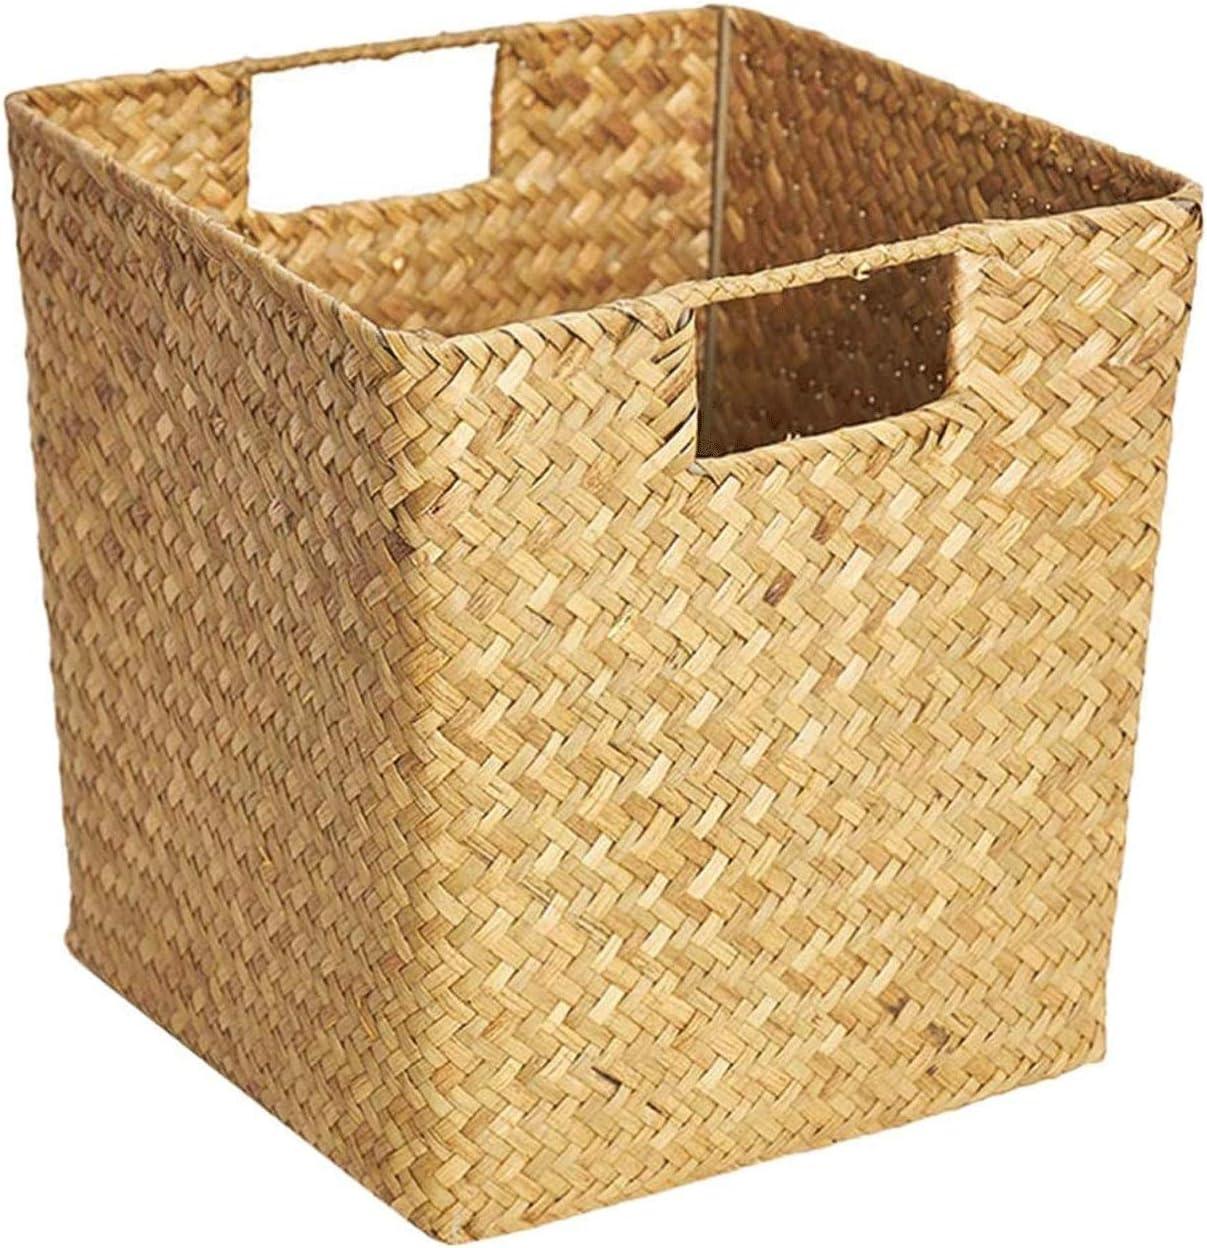 ZLHW Basket Seagrass Wicker Rattan Storage Picnic Box Now favorite on sale Bas